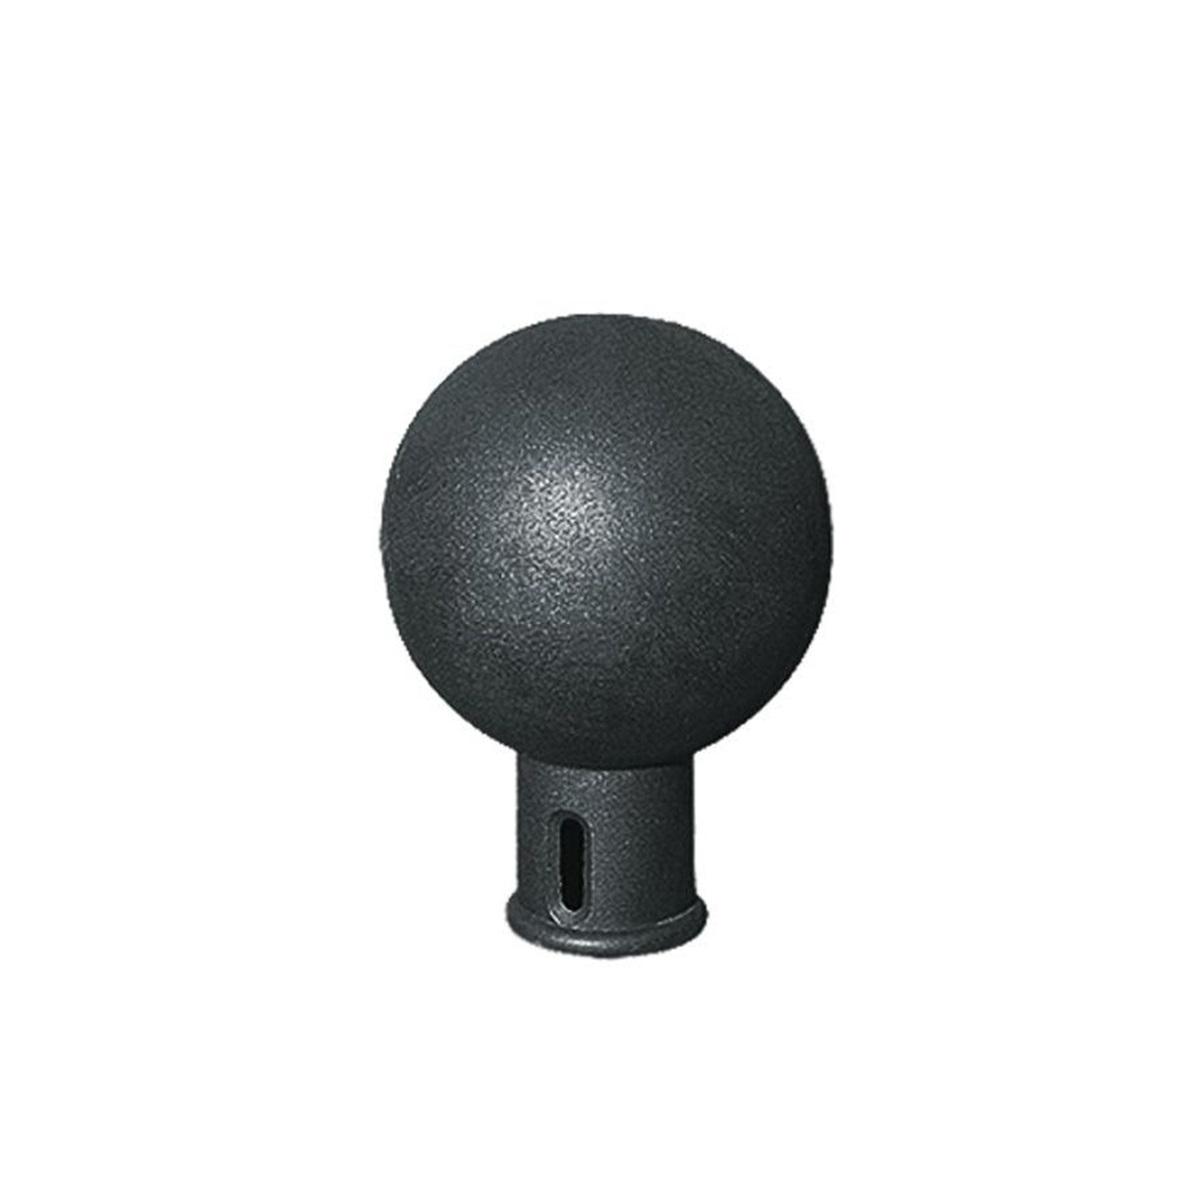 Pilona tipo bola pequeña de 300Ø - C-44A